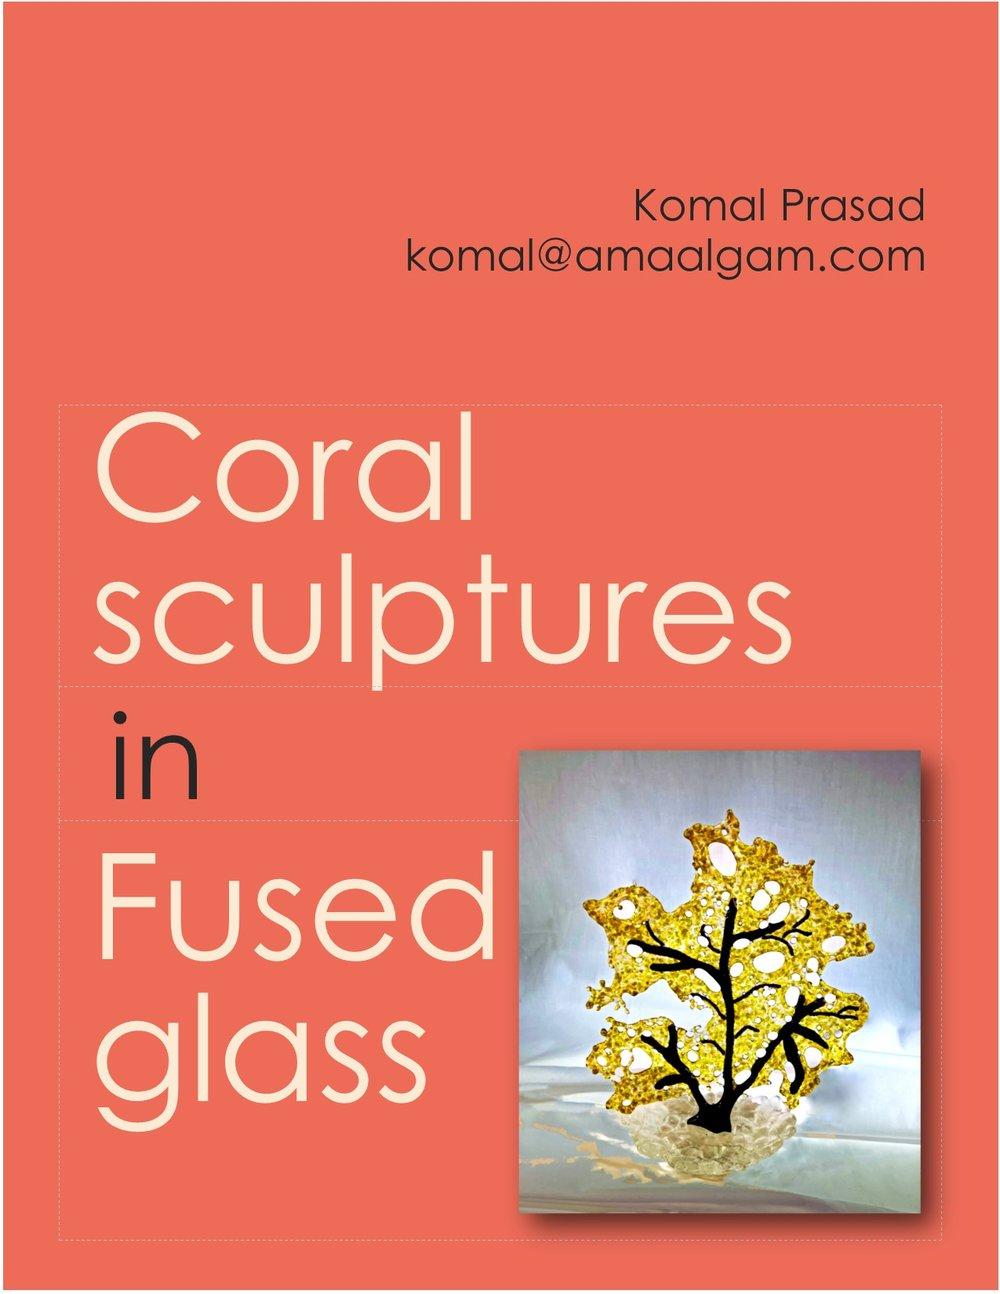 Coral Sculpture Tutorial v1.jpg